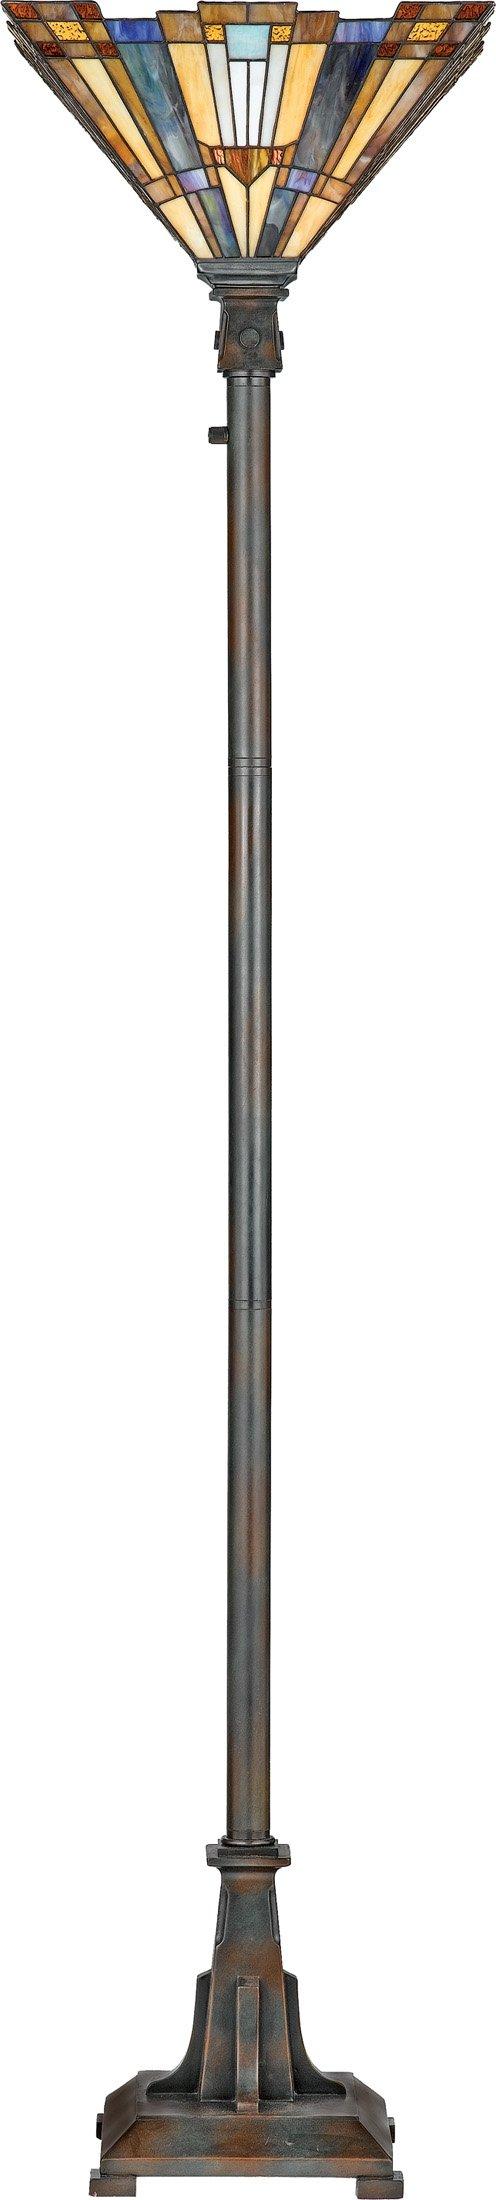 Quoizel TFIK9471VA 1-Light Inglenook Floor Lamp in Valiant Bronze by Quoizel